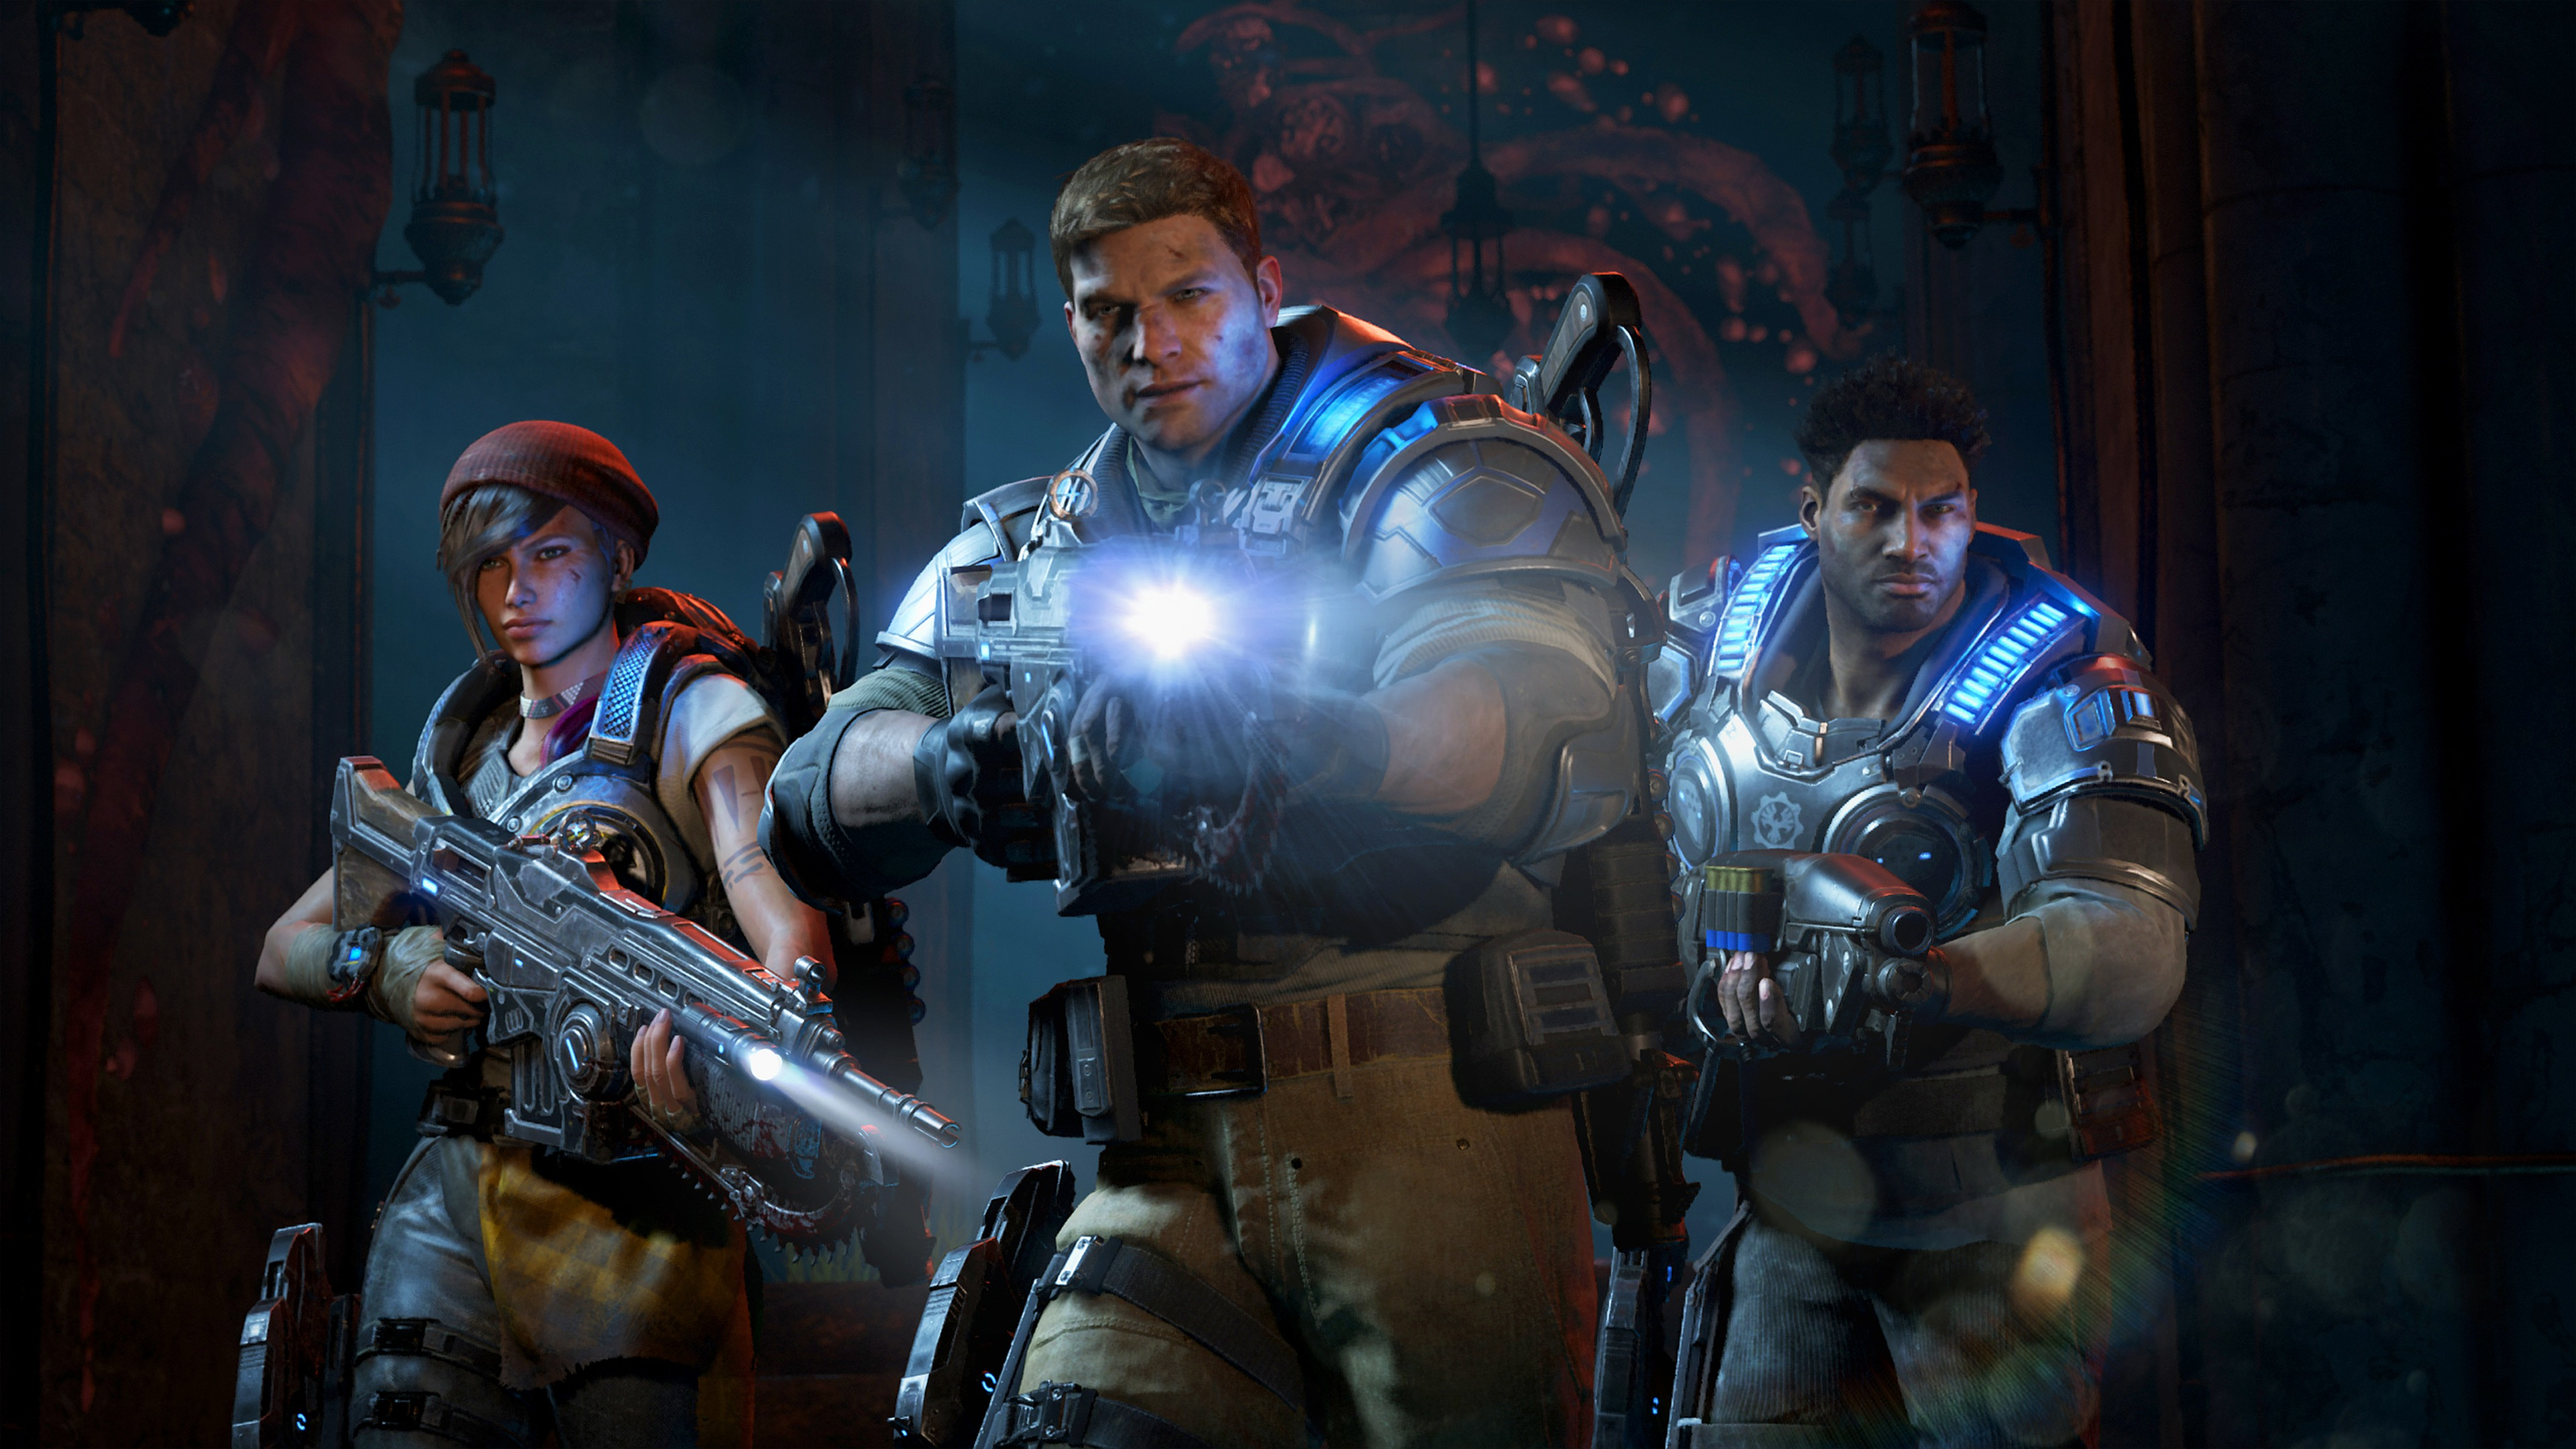 Gears Of War 4 2016 Video Game 4k Hd Desktop Wallpaper For: 2016 Gears Of War 4, HD Games, 4k Wallpapers, Images